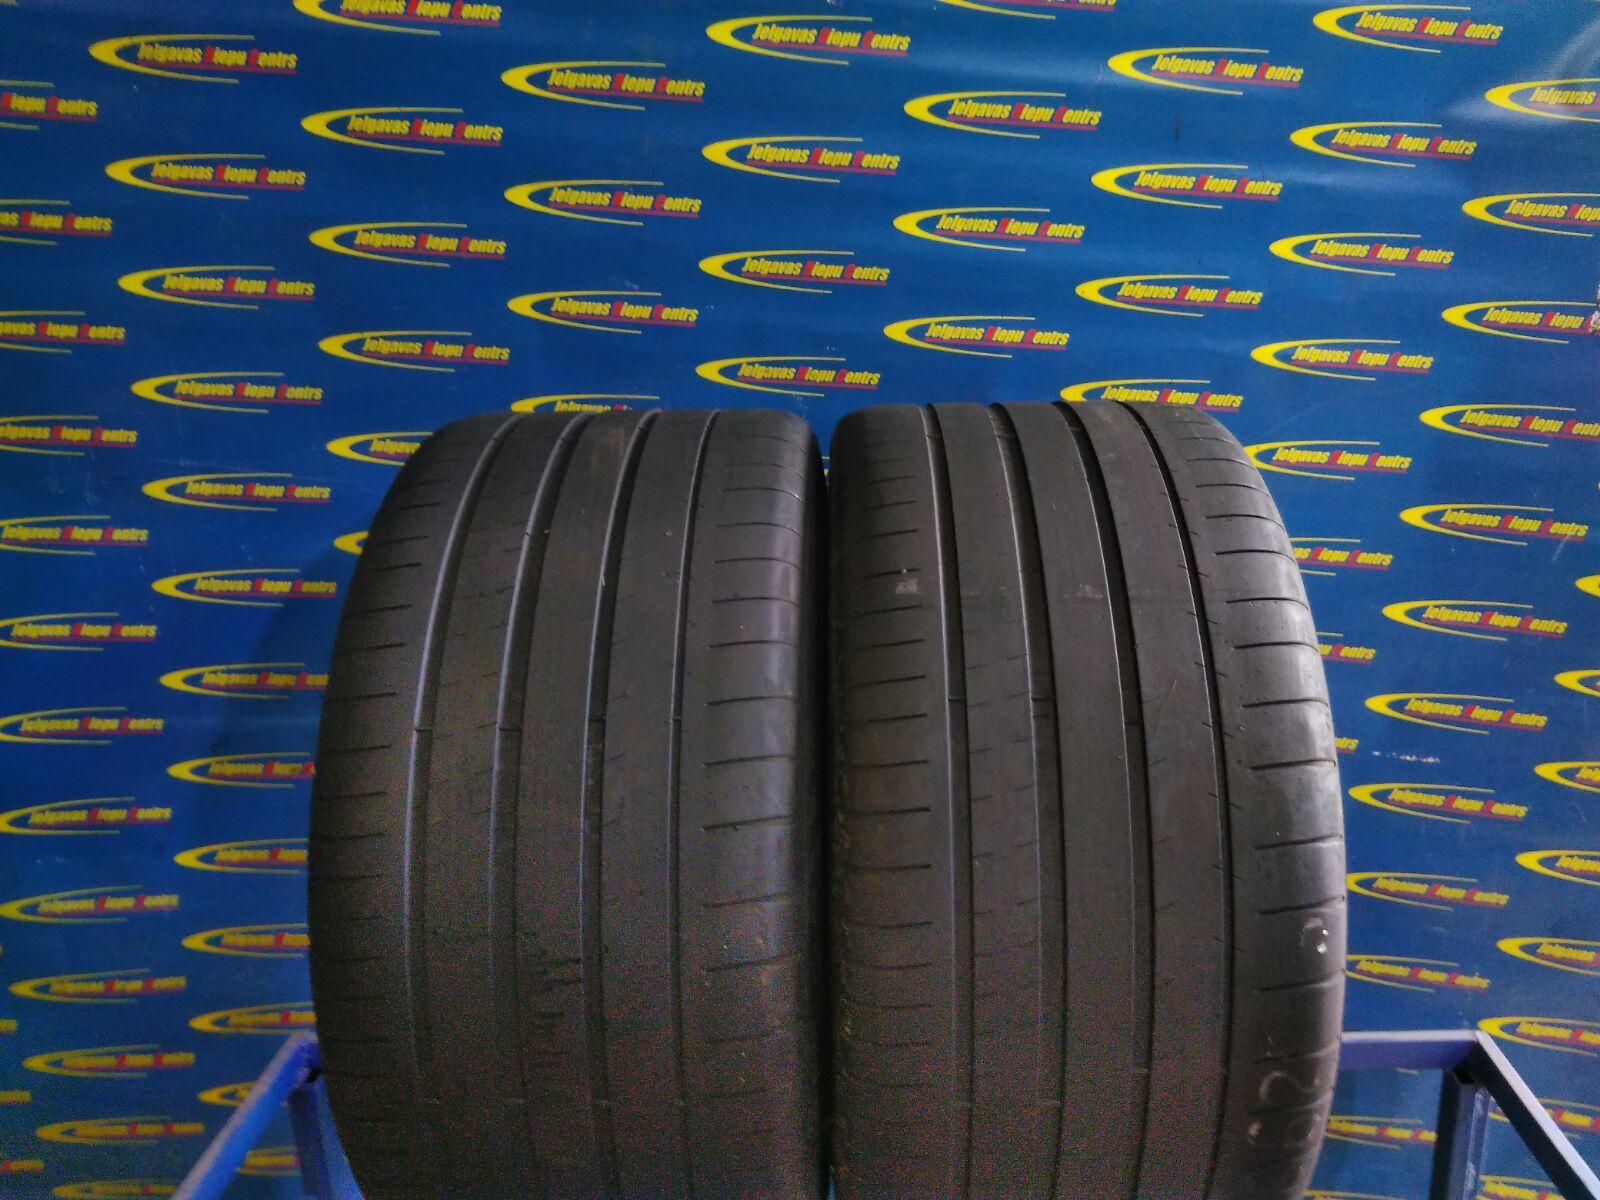 Lietota 295/35/R20 105Y Michelin PilotSuperSport (protektora dziļums 3.5mm)